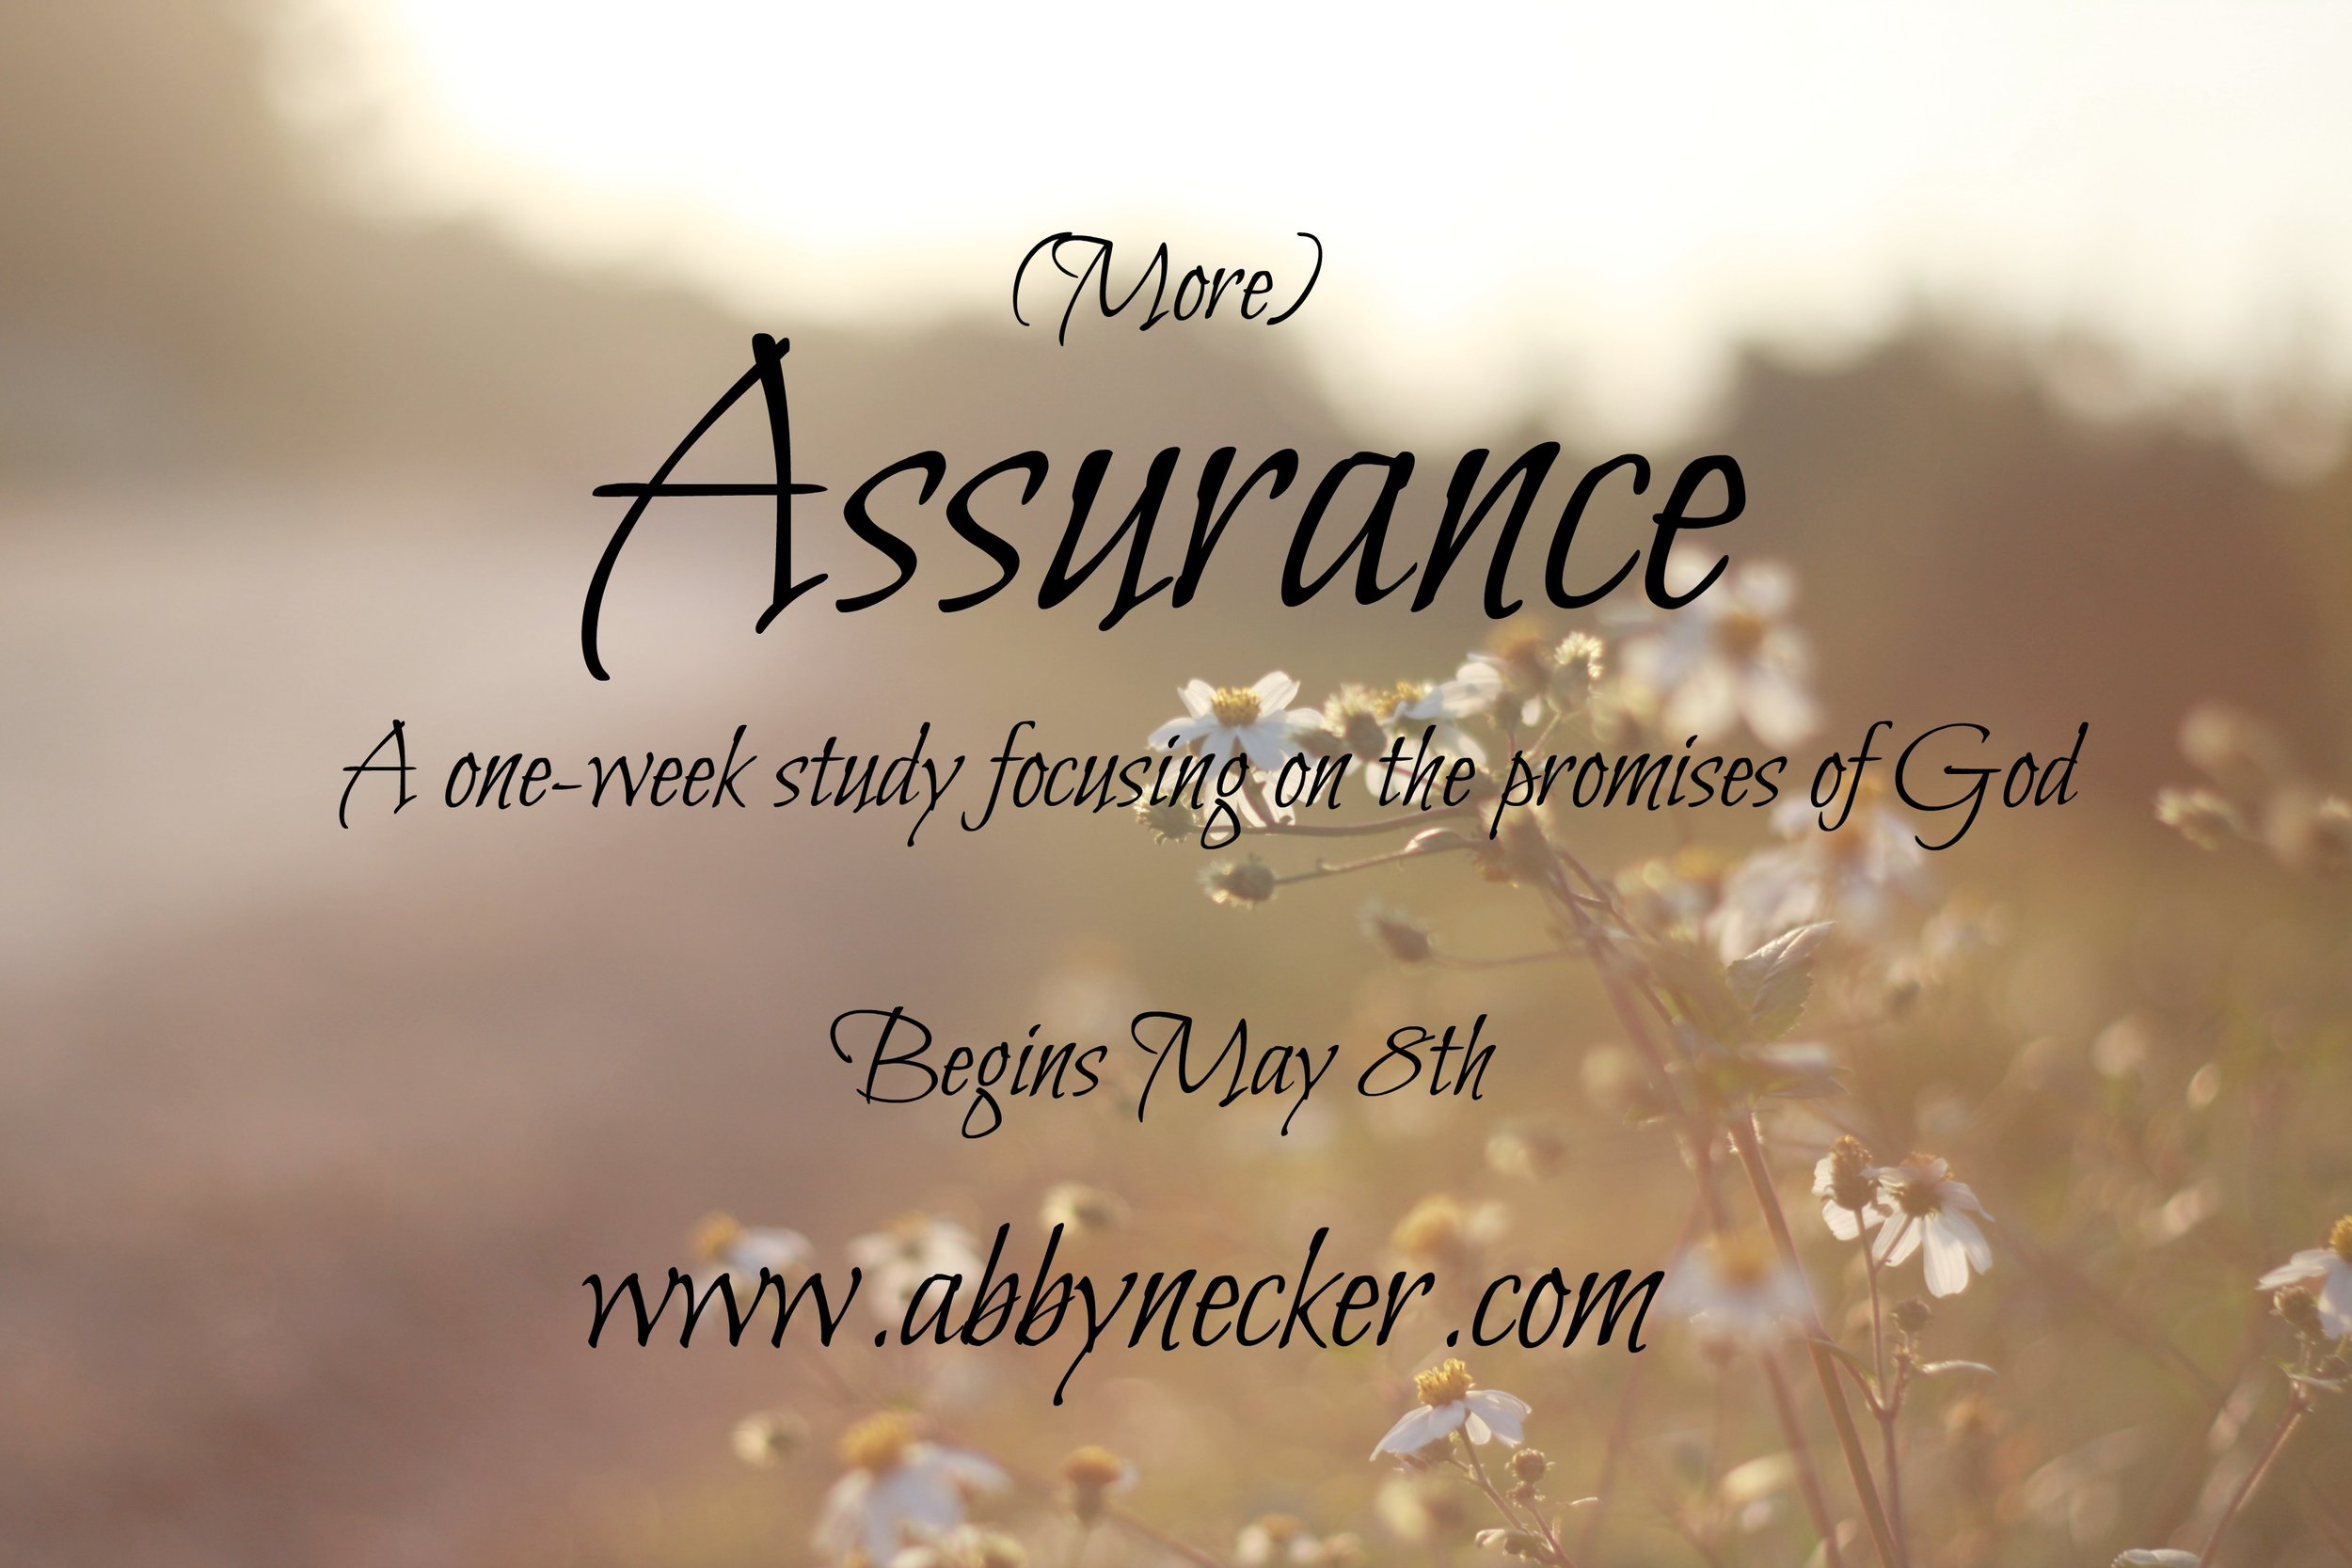 More Assurance